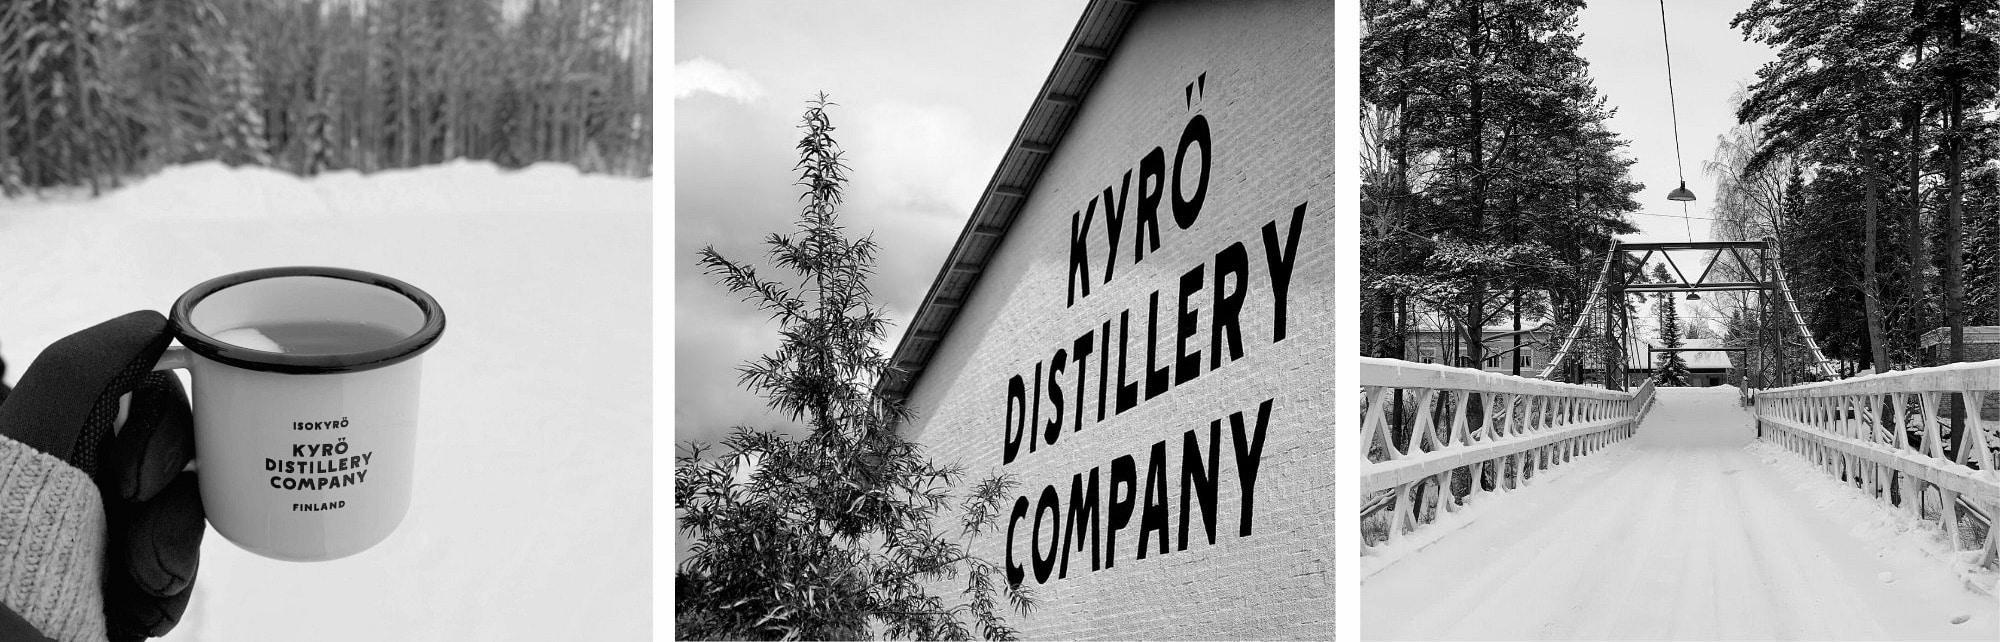 Interbrands Danmark besøger Kyrö Destillery Company